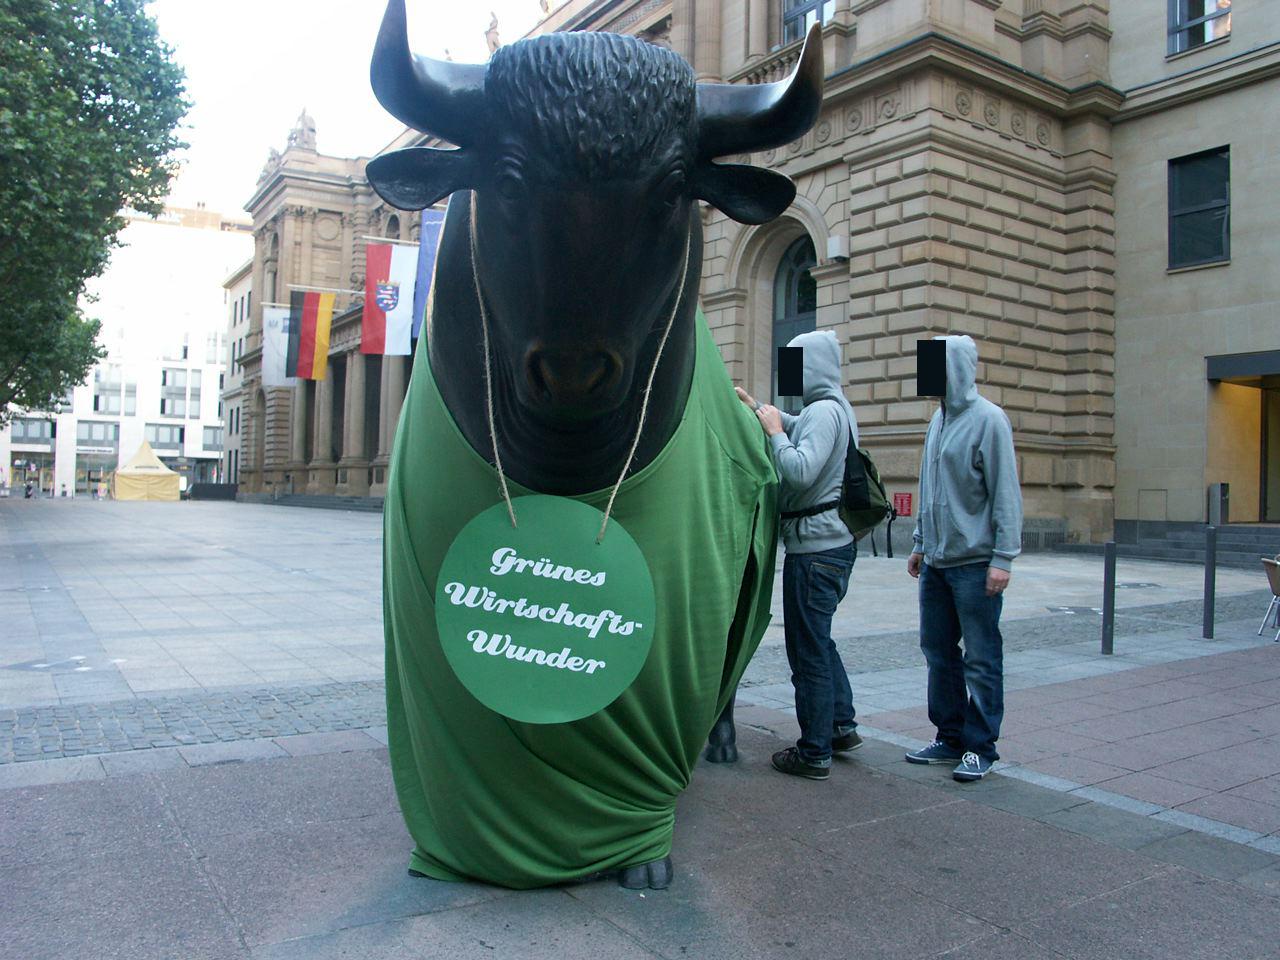 Bulle-1 in Guerilla-Aktion an der Frankfurter Börse